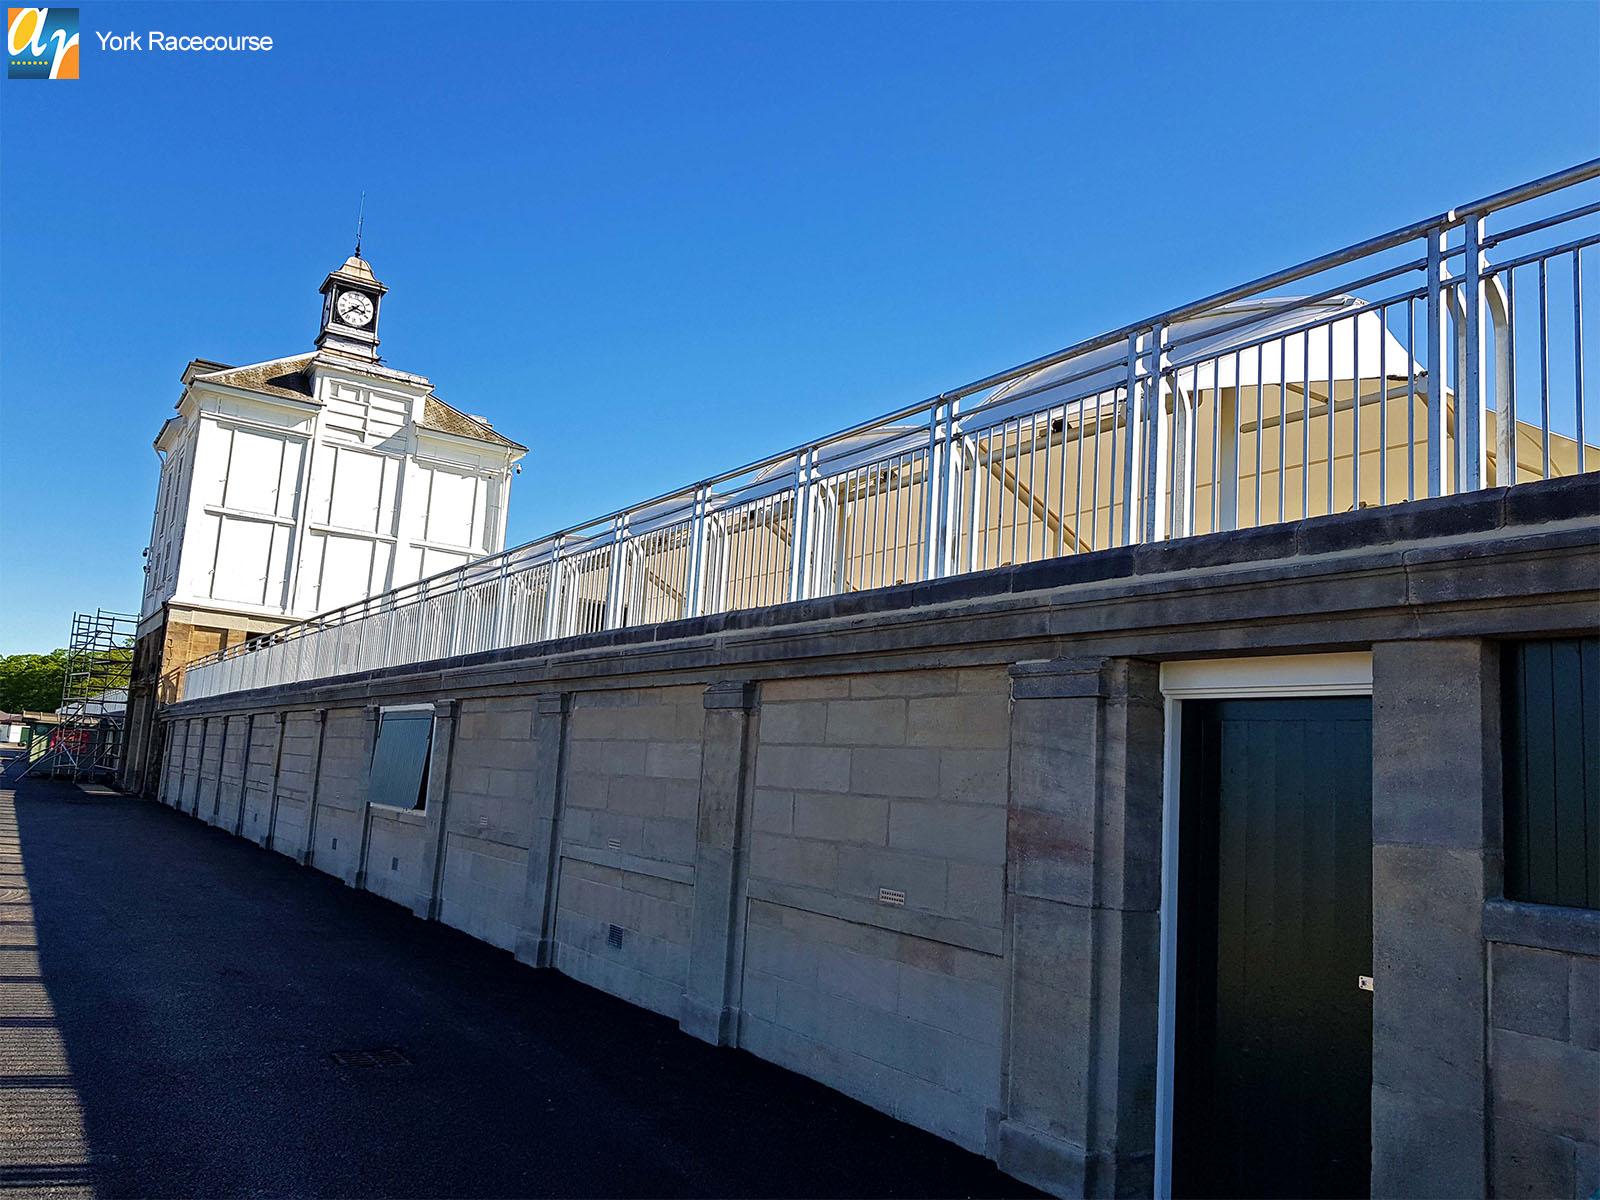 York Racecourse bespoke metal balustrade